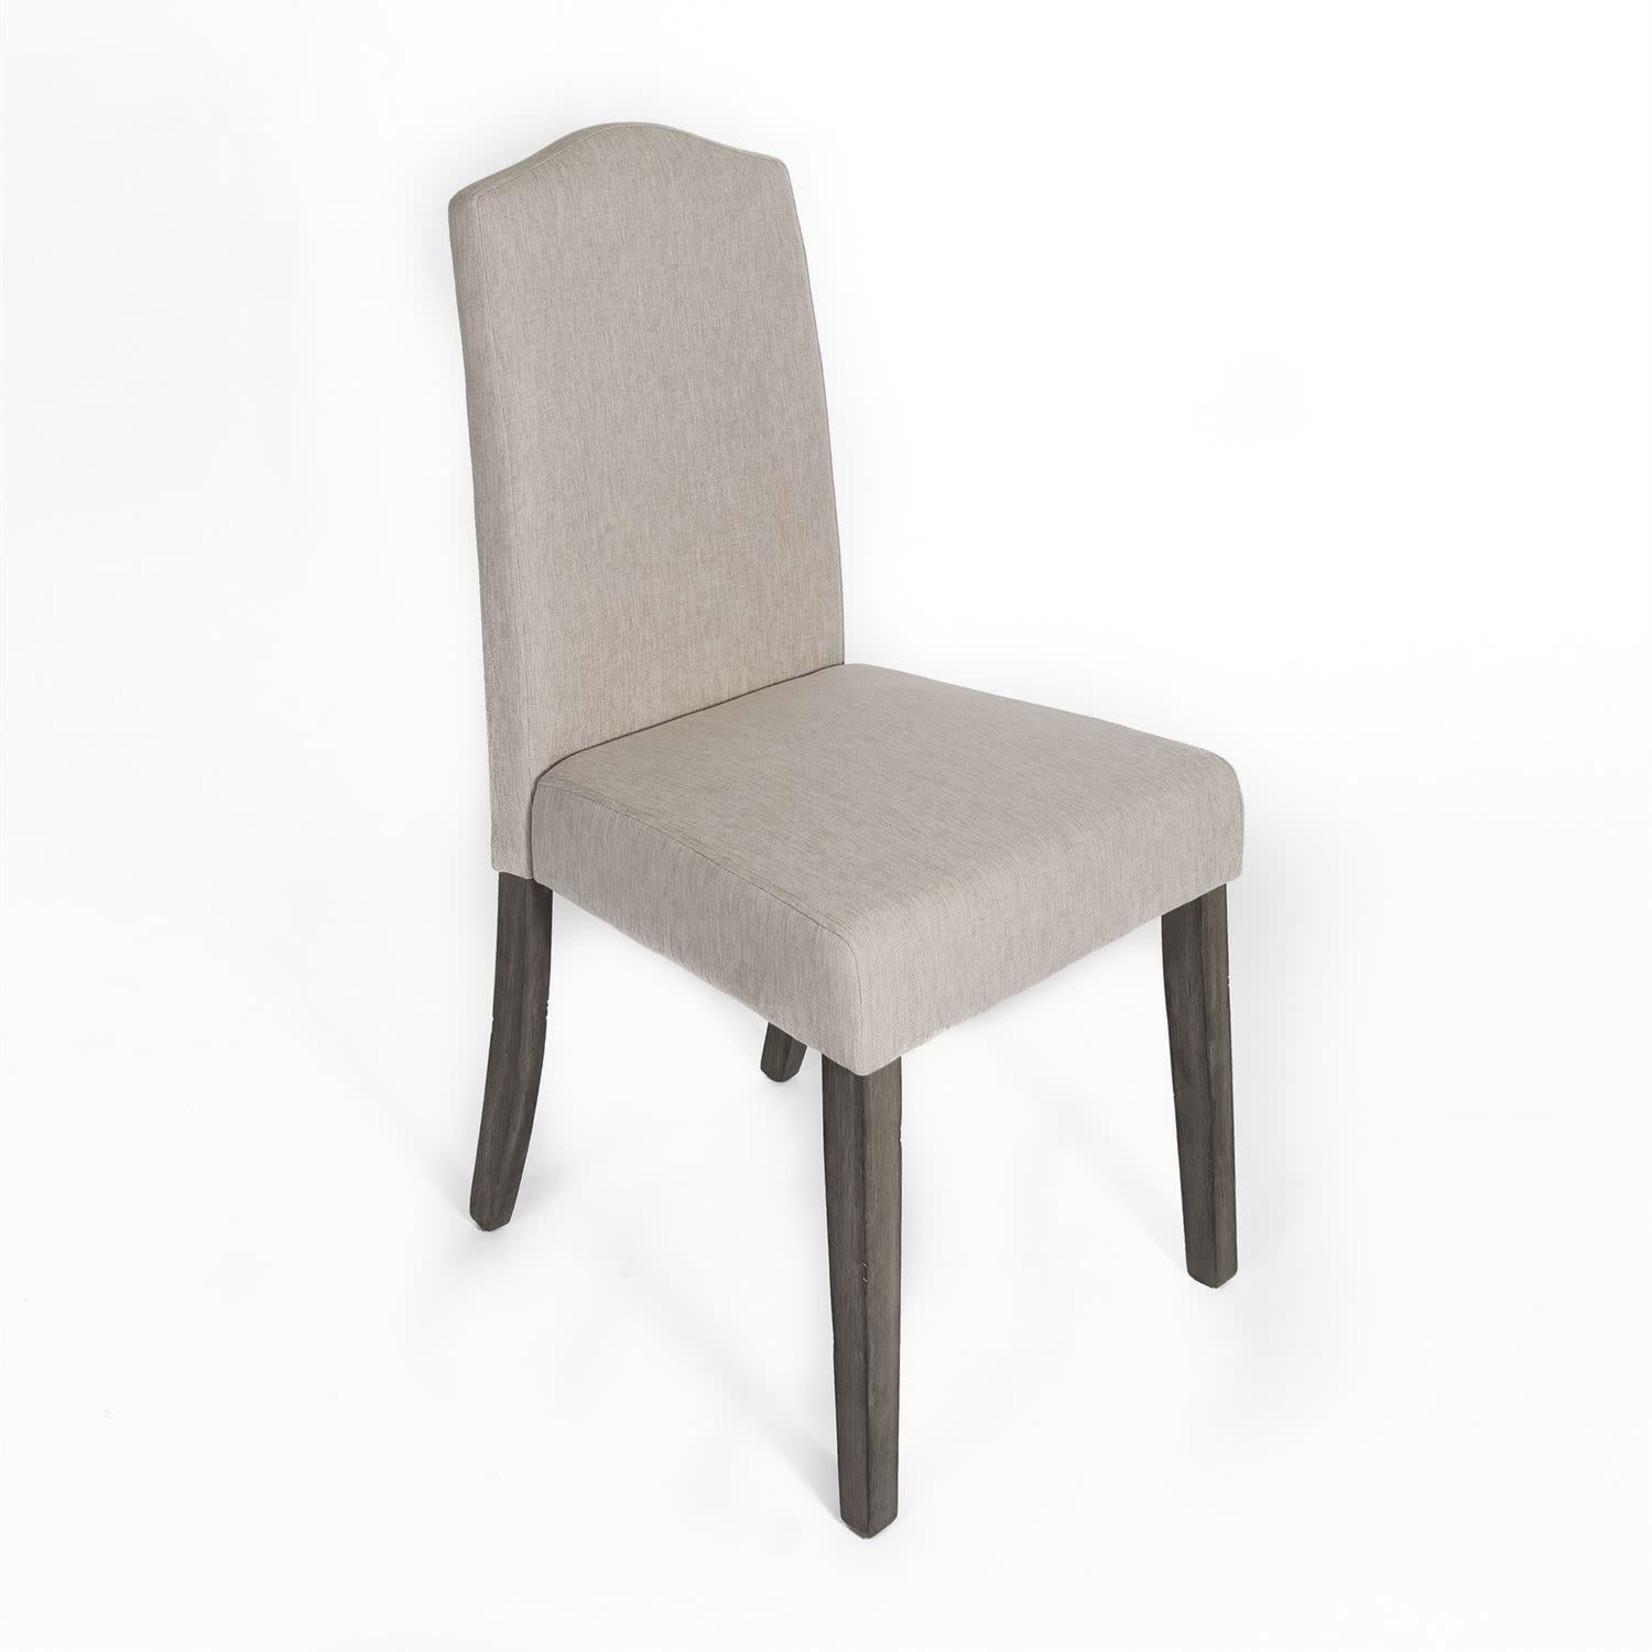 Carolina Lakes Upholstered Dining Chair